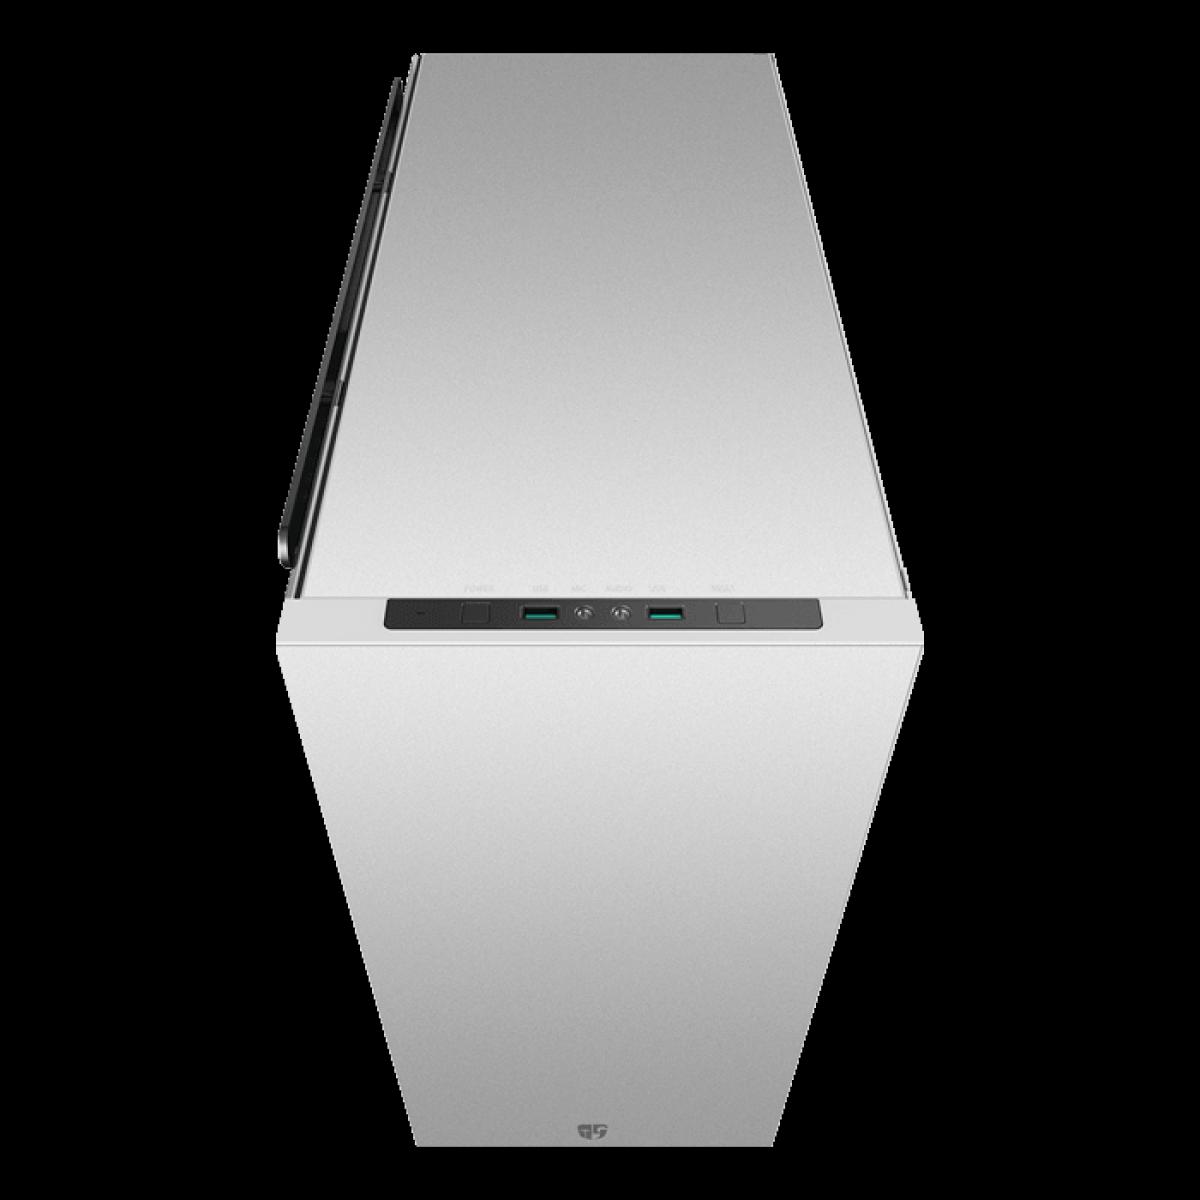 Gabinete Gamer DeepCool Macube 550, Full Tower, Vidro Temperado, White, Sem Fonte, Com 1 Fan, GS-ATX-MACUBE550-WHG0P